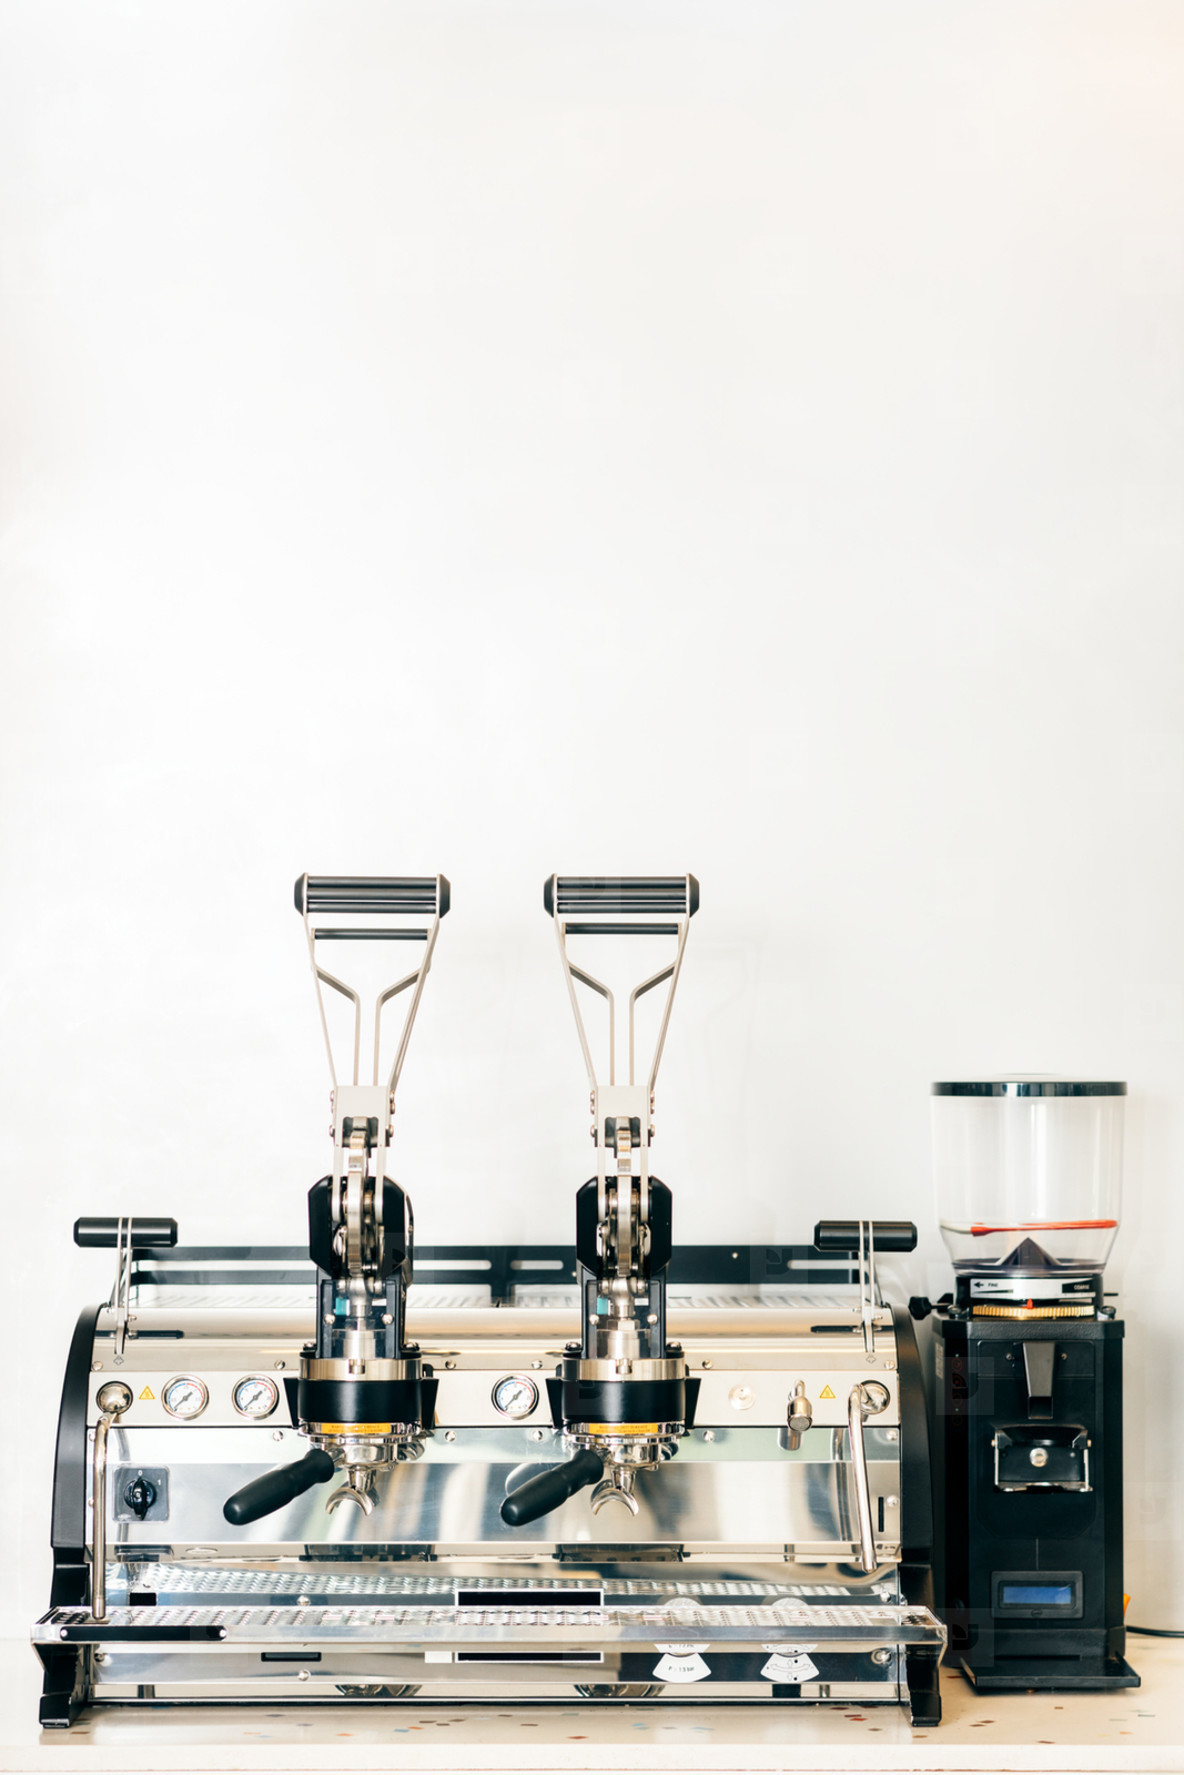 A vintage coffee machine